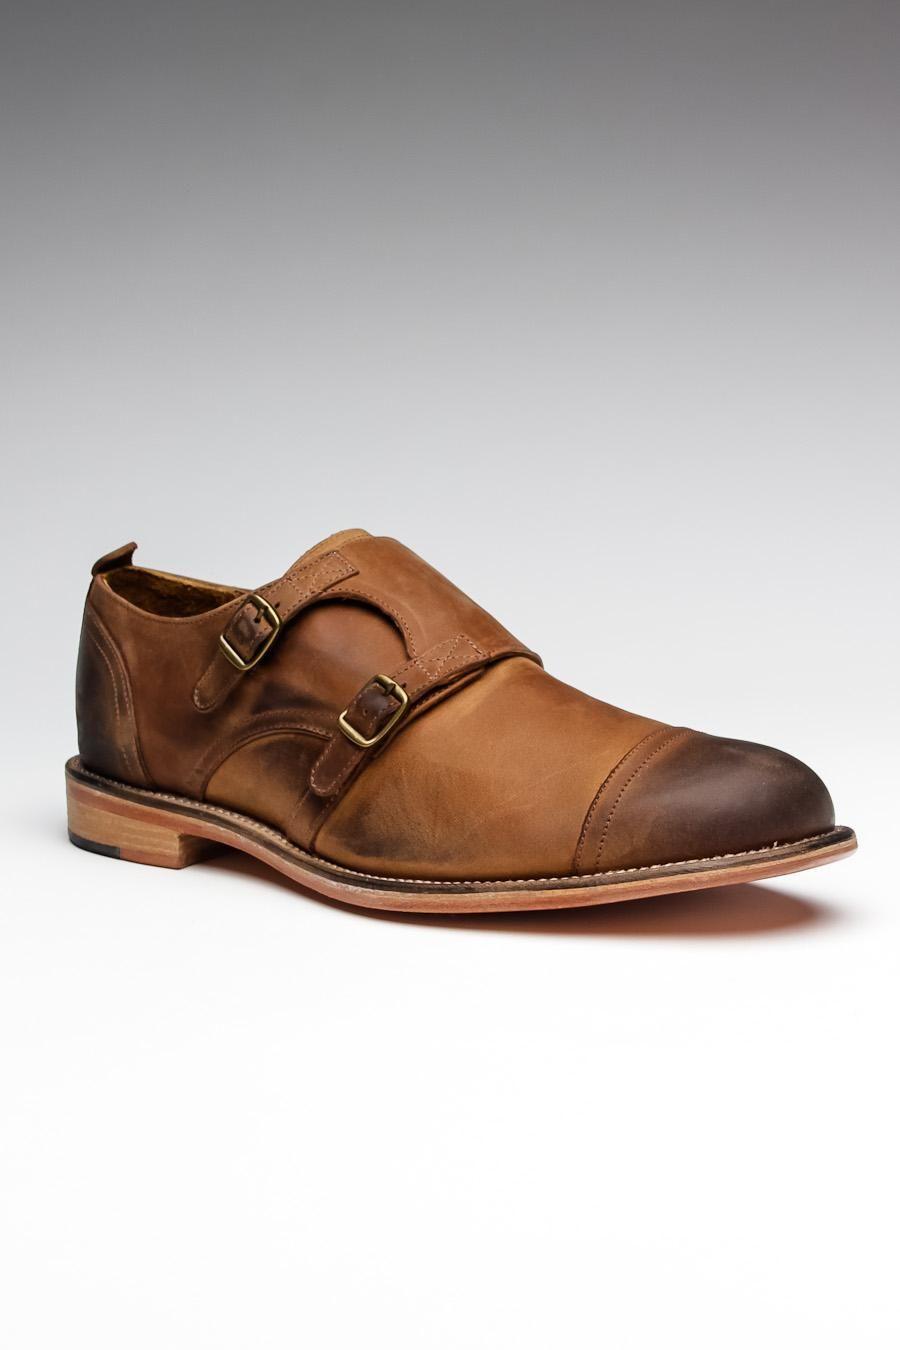 Troop Shoe